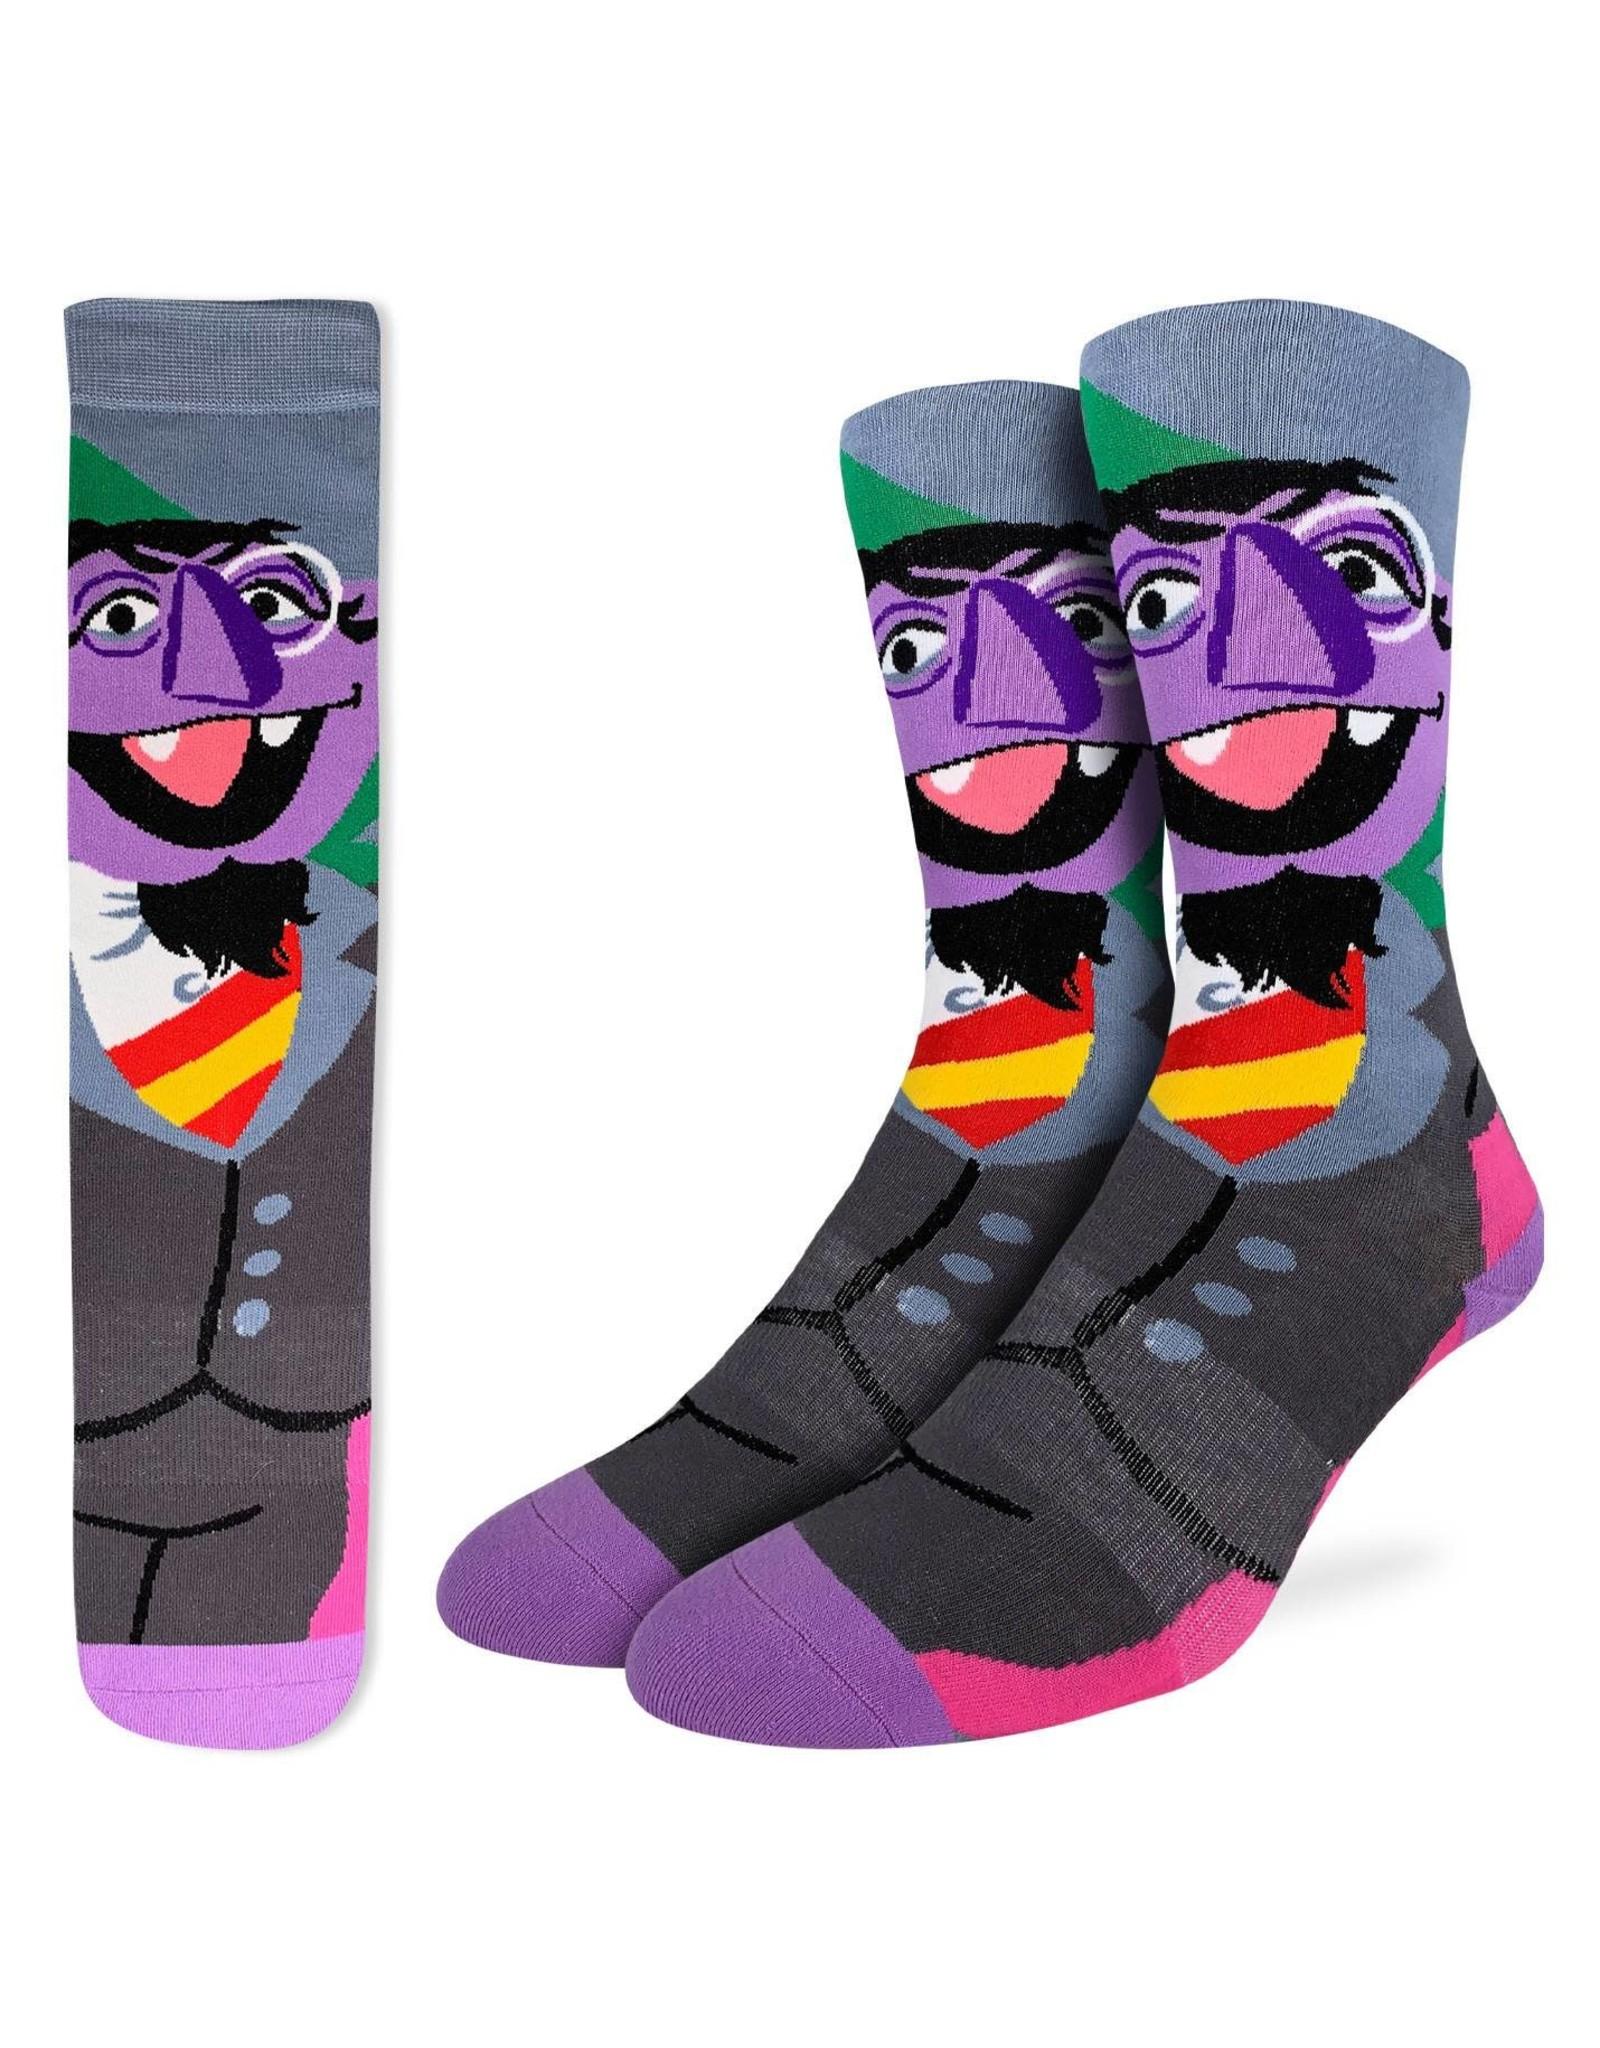 Good Luck Sock The Count Socks, 8-13